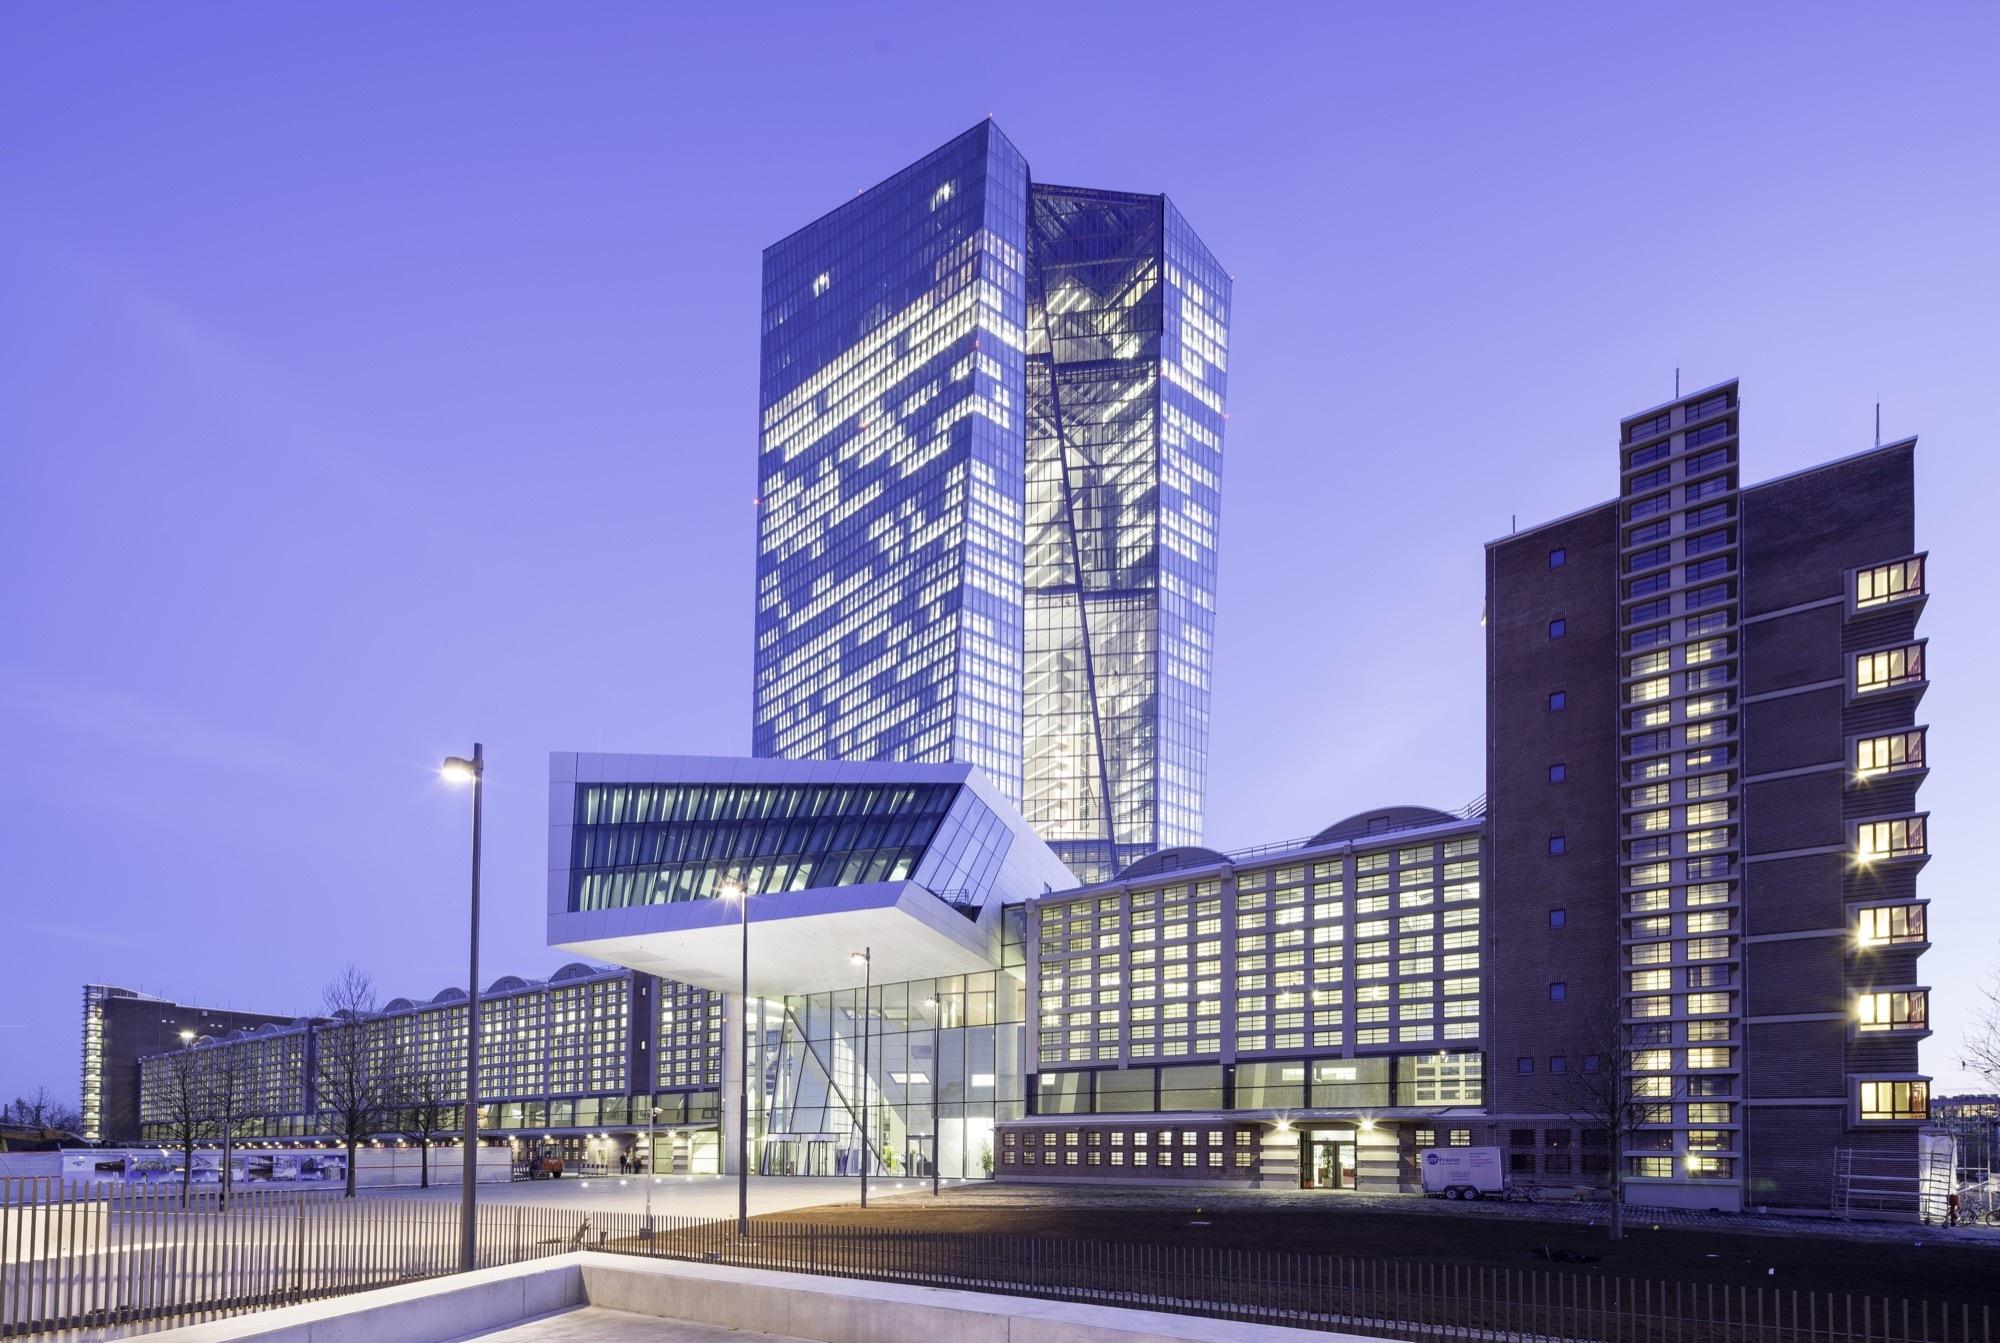 European Central Bank Coop Himmelb L Au Archdaily